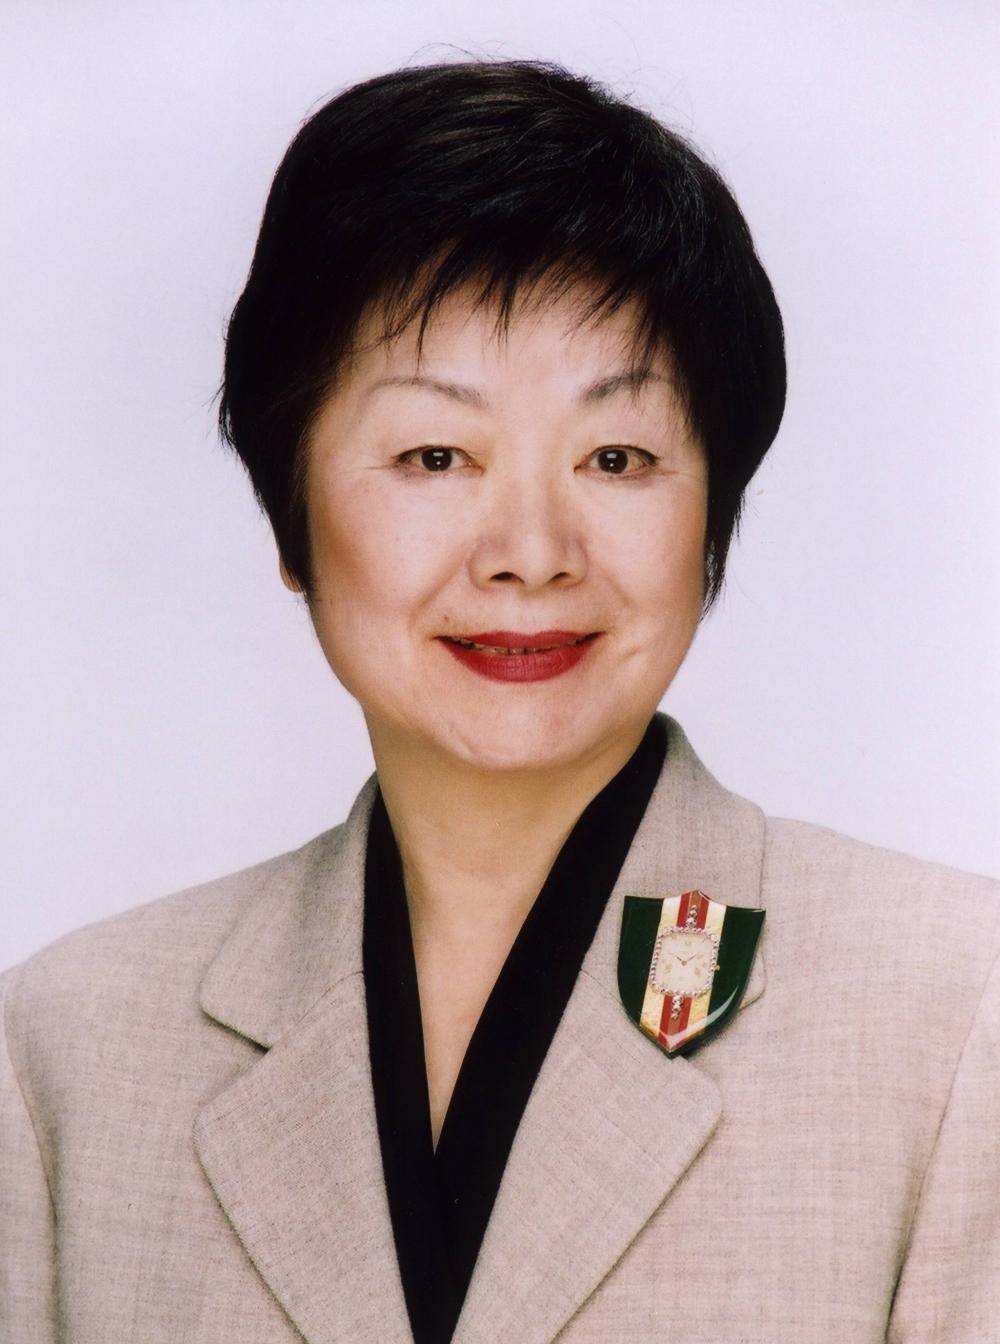 File:ToshikoMaeda.png